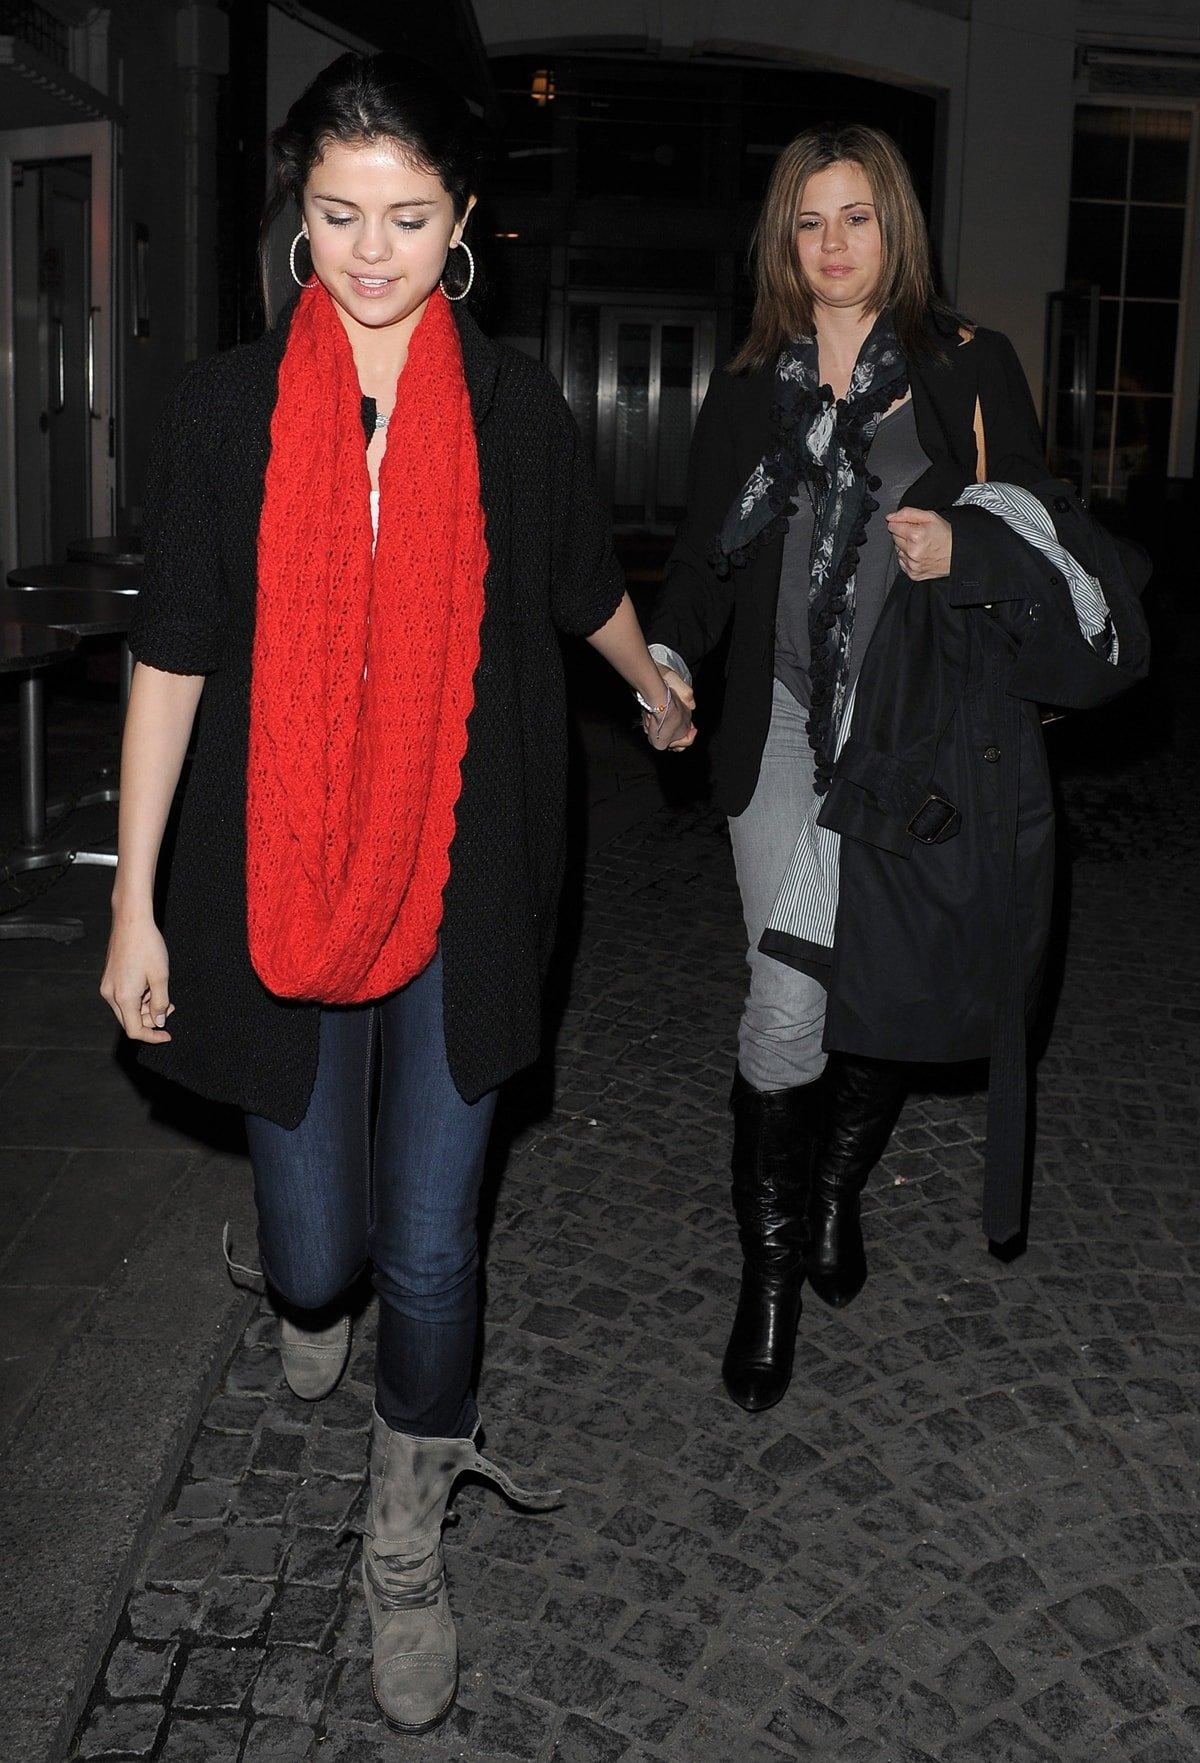 Mandy Teefey (born Amanda Dawn Cornett) gave birth to her daughter Selena Gomez when she was just 16 years old